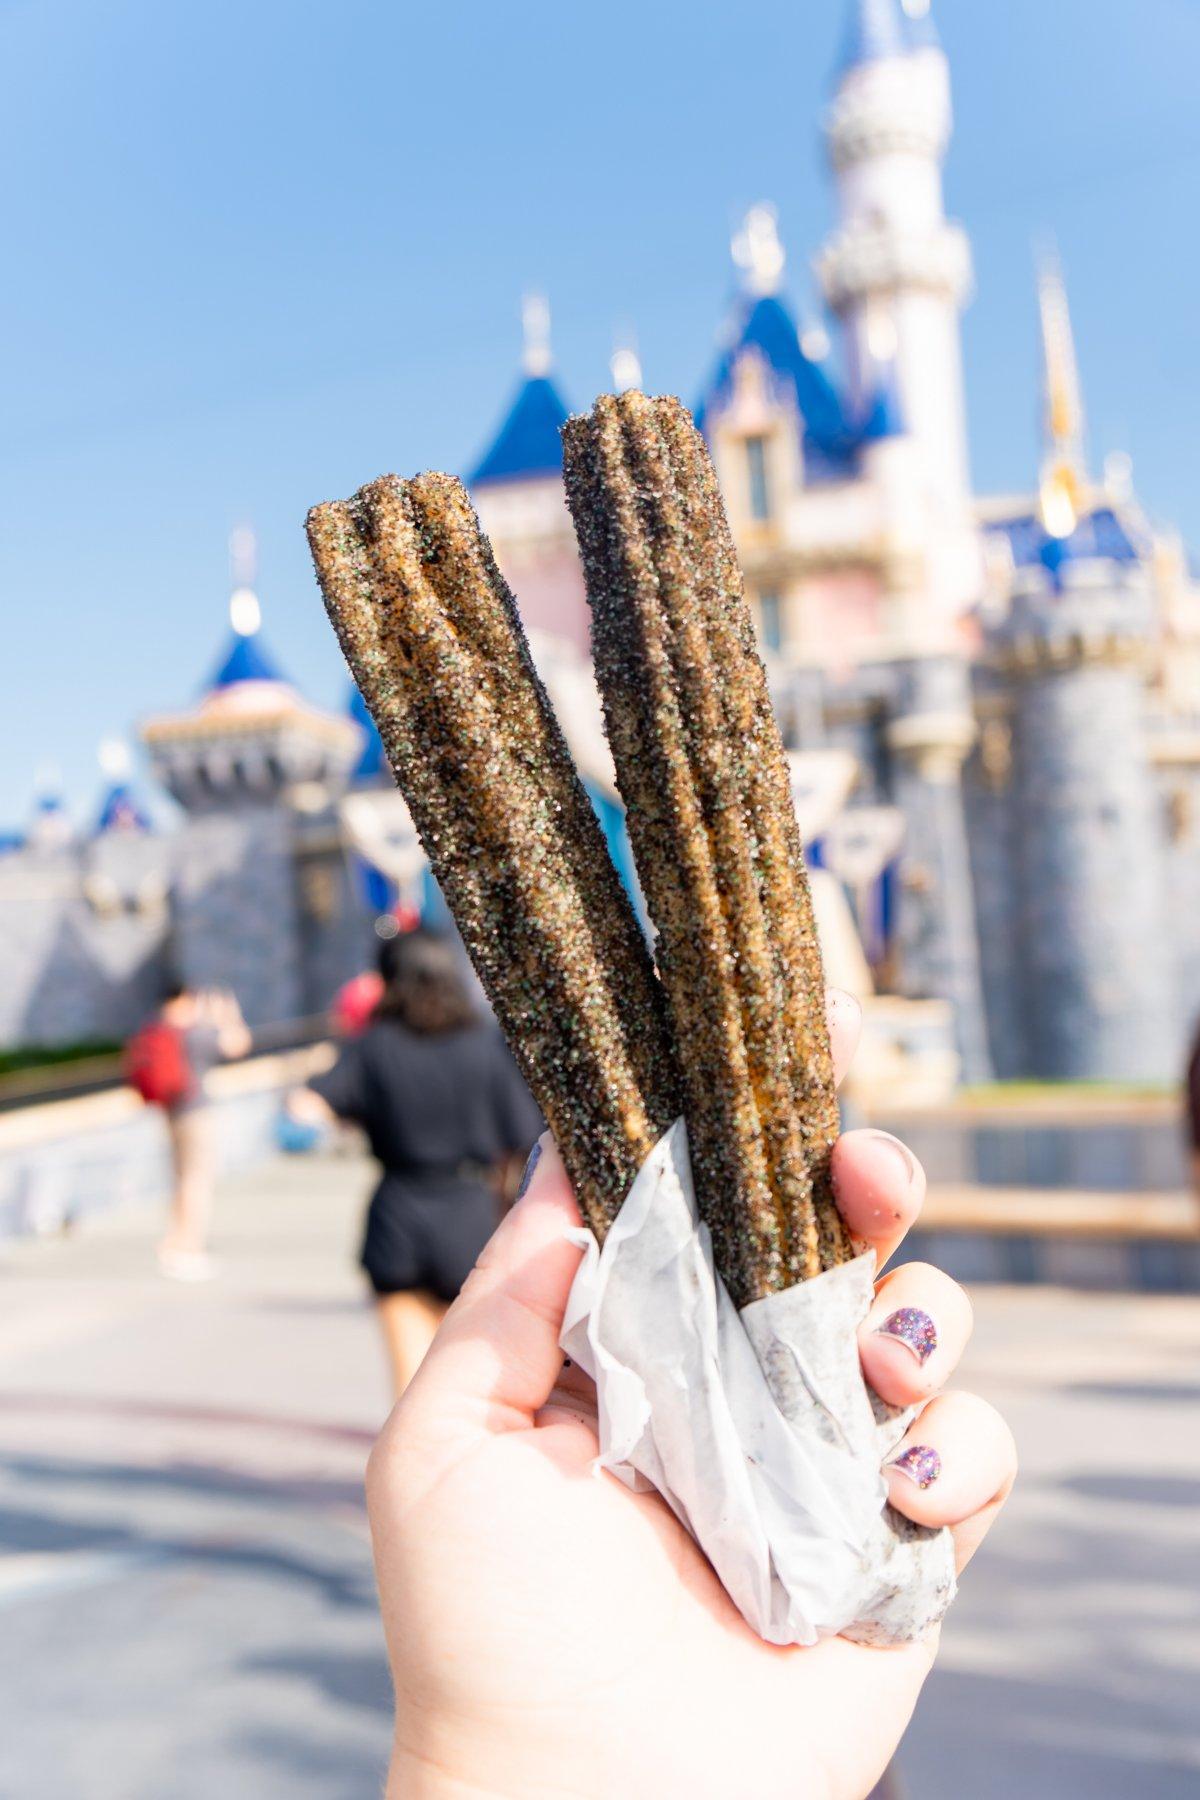 Maleficent churro in Disneyland